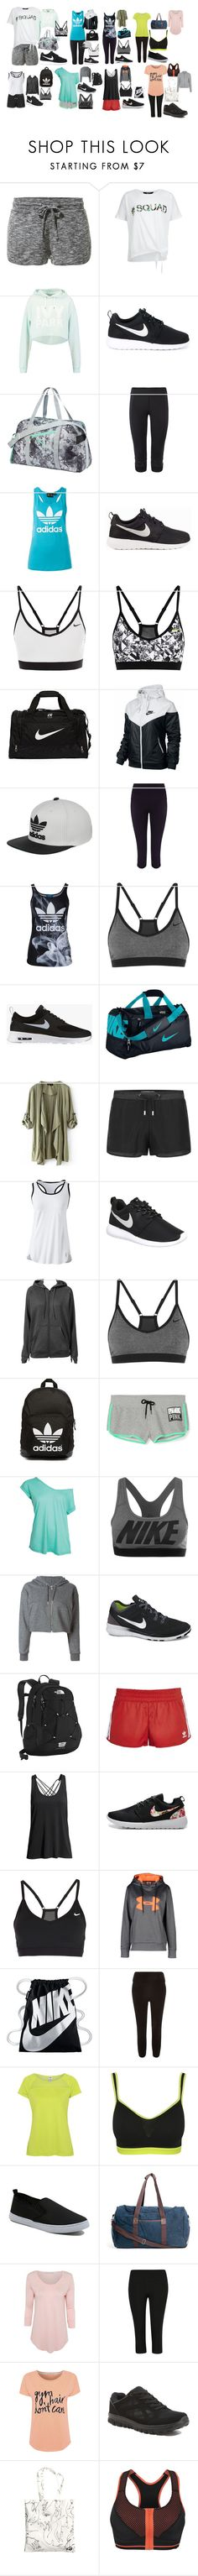 """sport"" by strawberryfelton on Polyvore featuring Mode, MANGO, New Look, Ivy Park, NIKE, Puma, adidas, Sweaty Betty, Lands' End und adidas Originals"